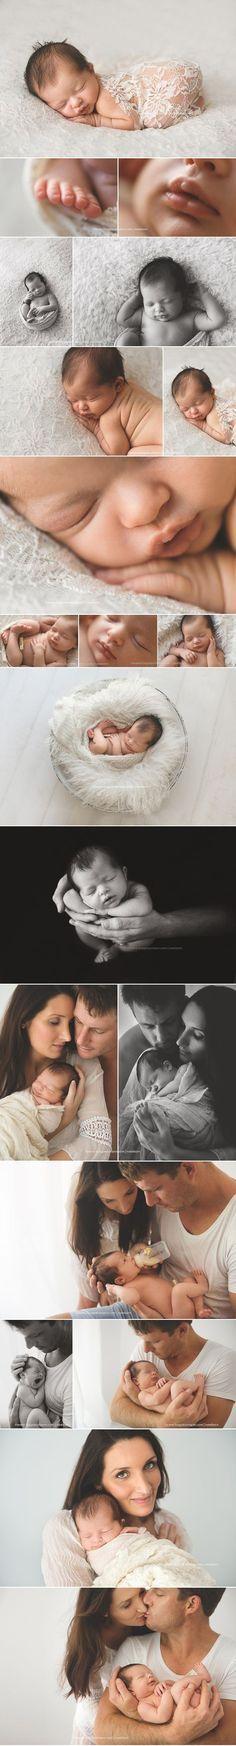 Matilda | Perth Maternity and Newborn Photographer » Perth Baby Photographer Lisa Goessmann Modern Photography Newborn Photography babies and pregnancy